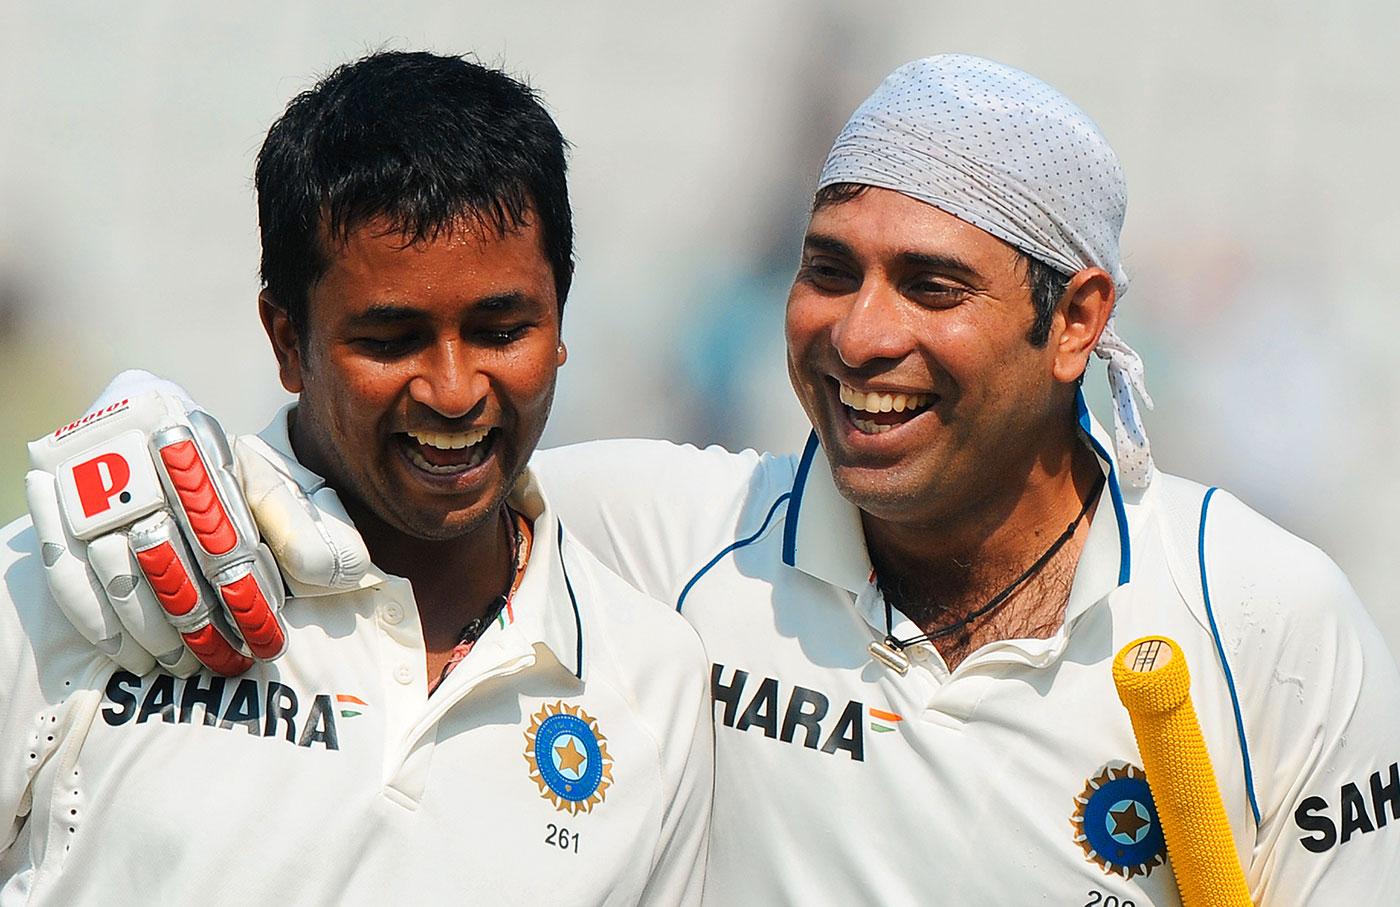 VVS Laxman and Pragyan Ojha celebrate the closest of victories, 1st Test, Mohali, India v Australia, 5th day, October 5, 2010